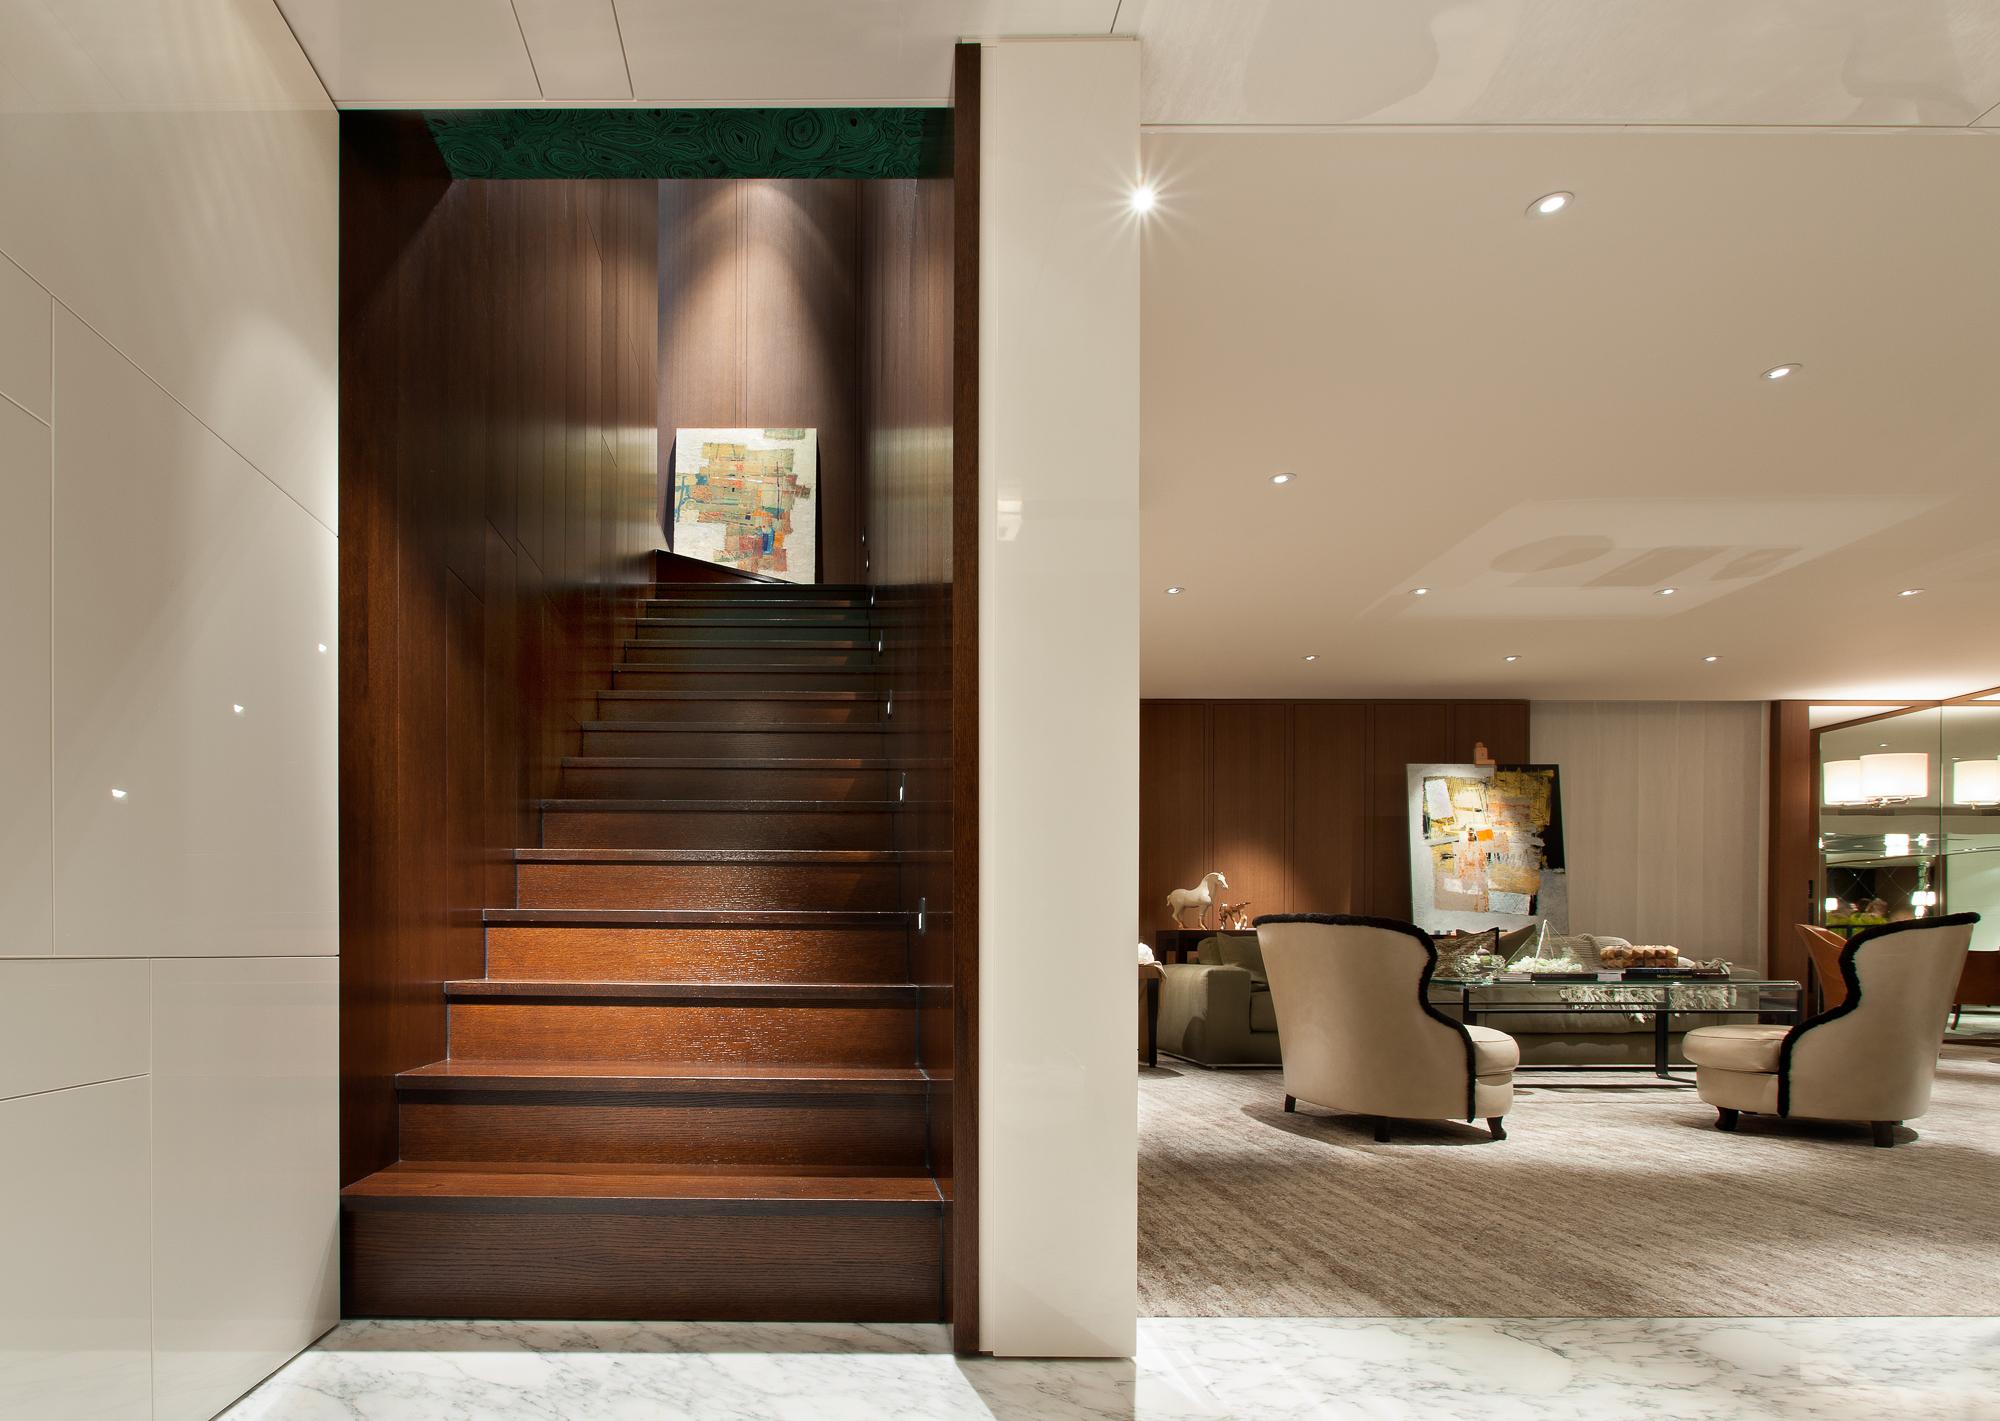 Ararat-Park-Hyatt-Moscow-Penthouse-Living-Room.jpg